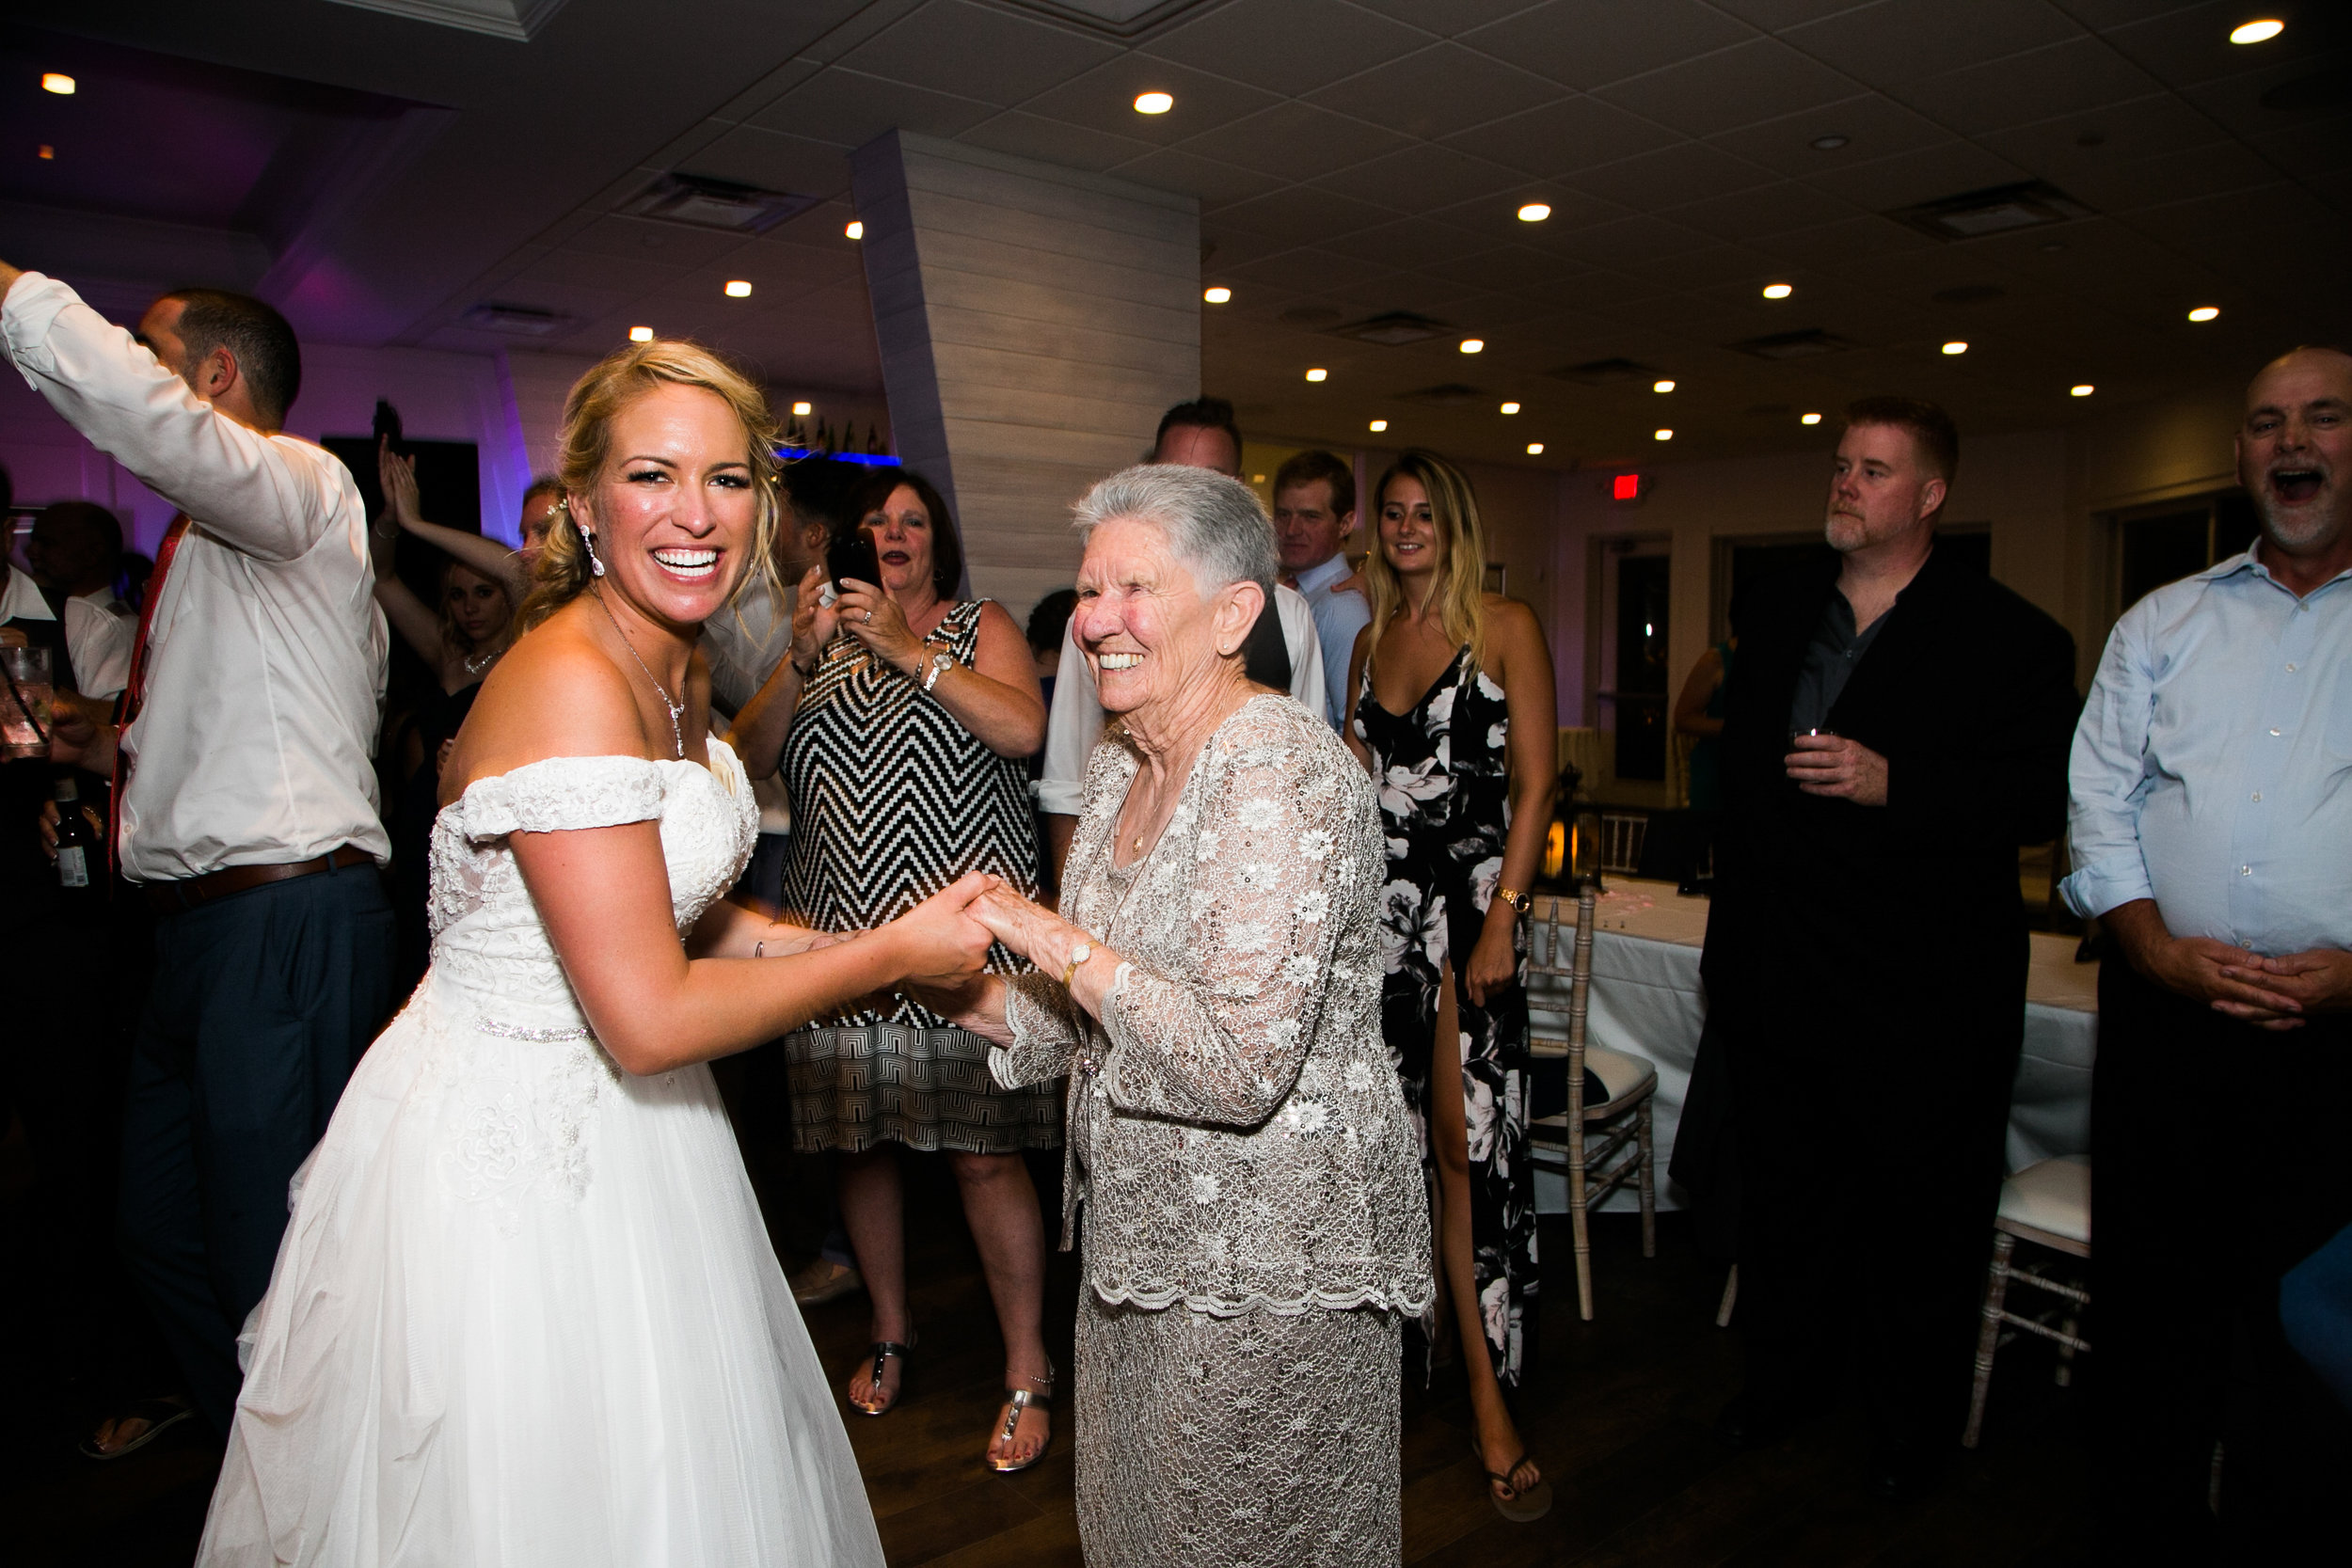 ICONA GOLDEN INN AVALON NJ WEDDING PHOTOGRAPHY  - 103.jpg